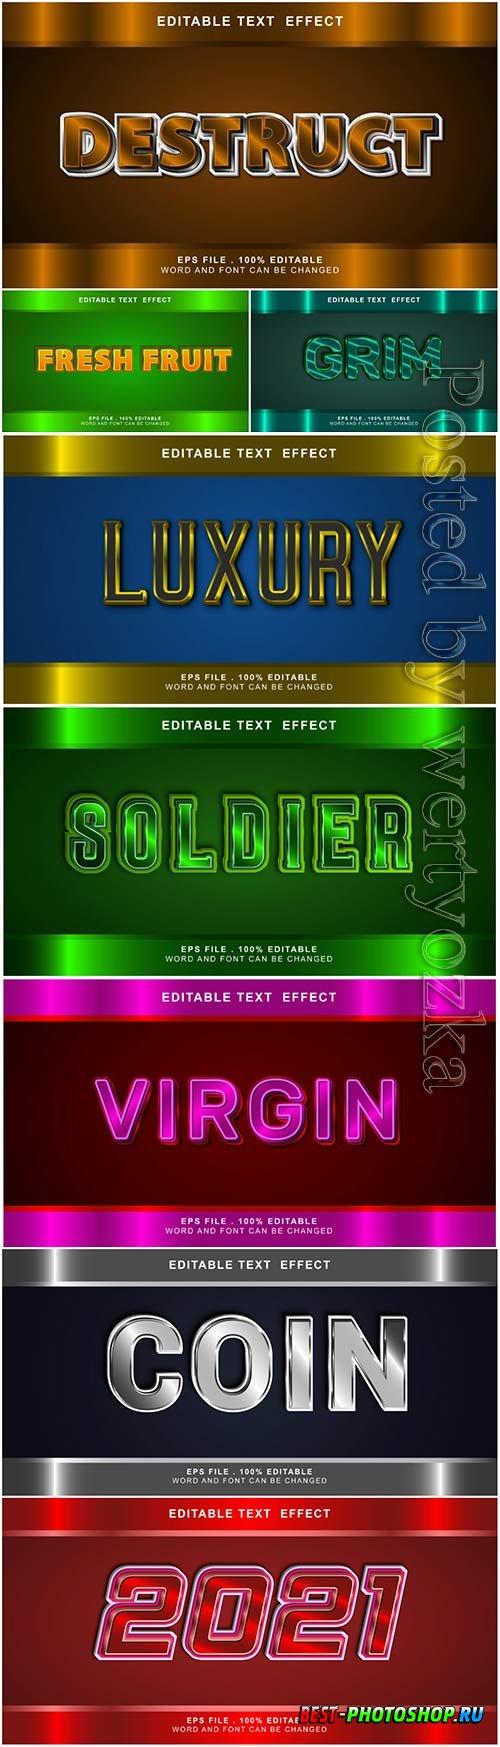 3d editable text style effect vector vol 2